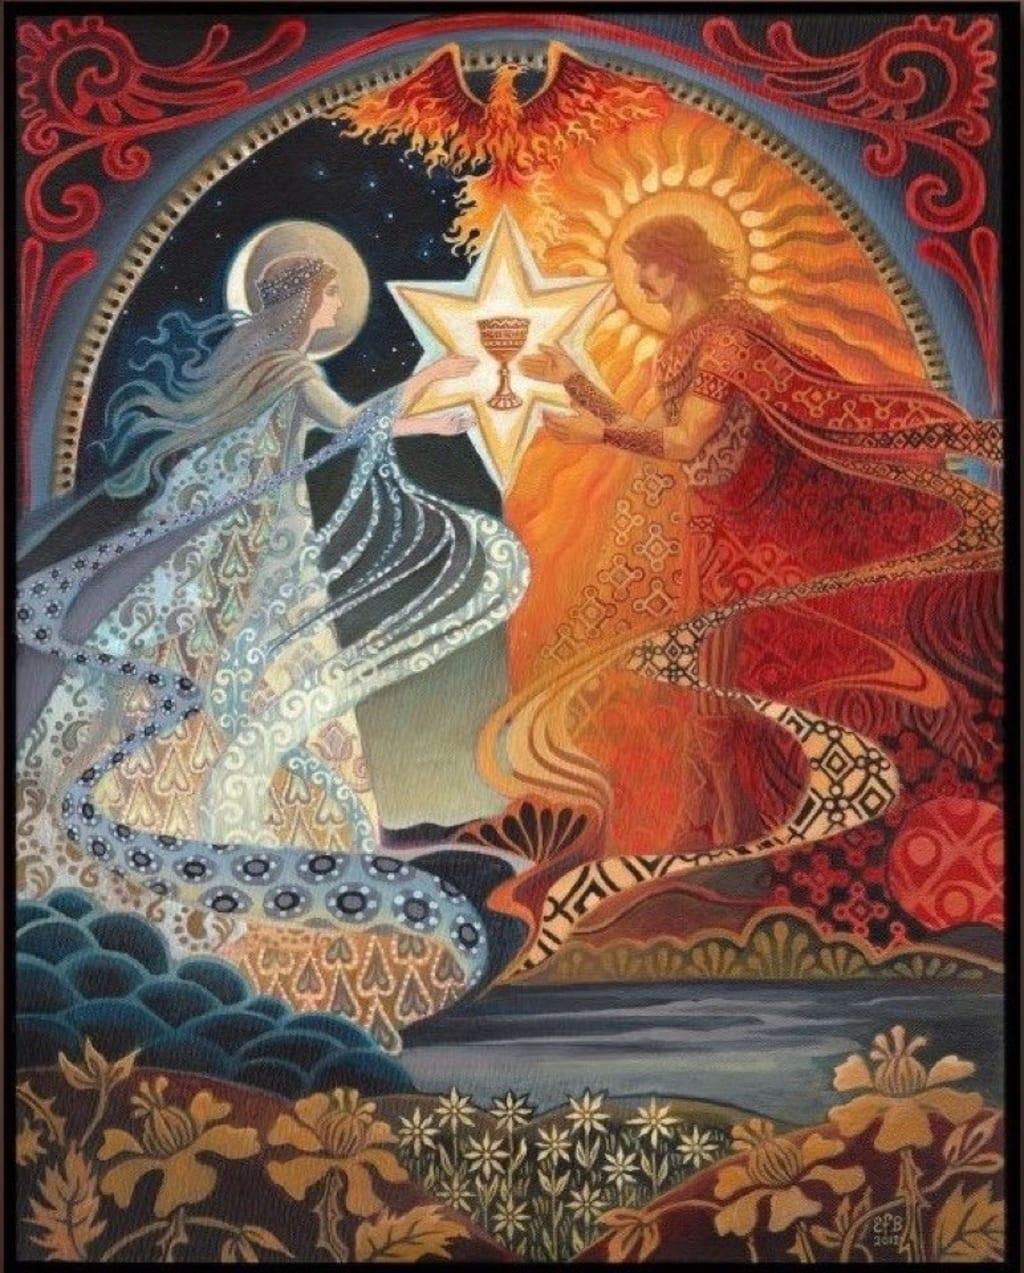 A Celestial Romance